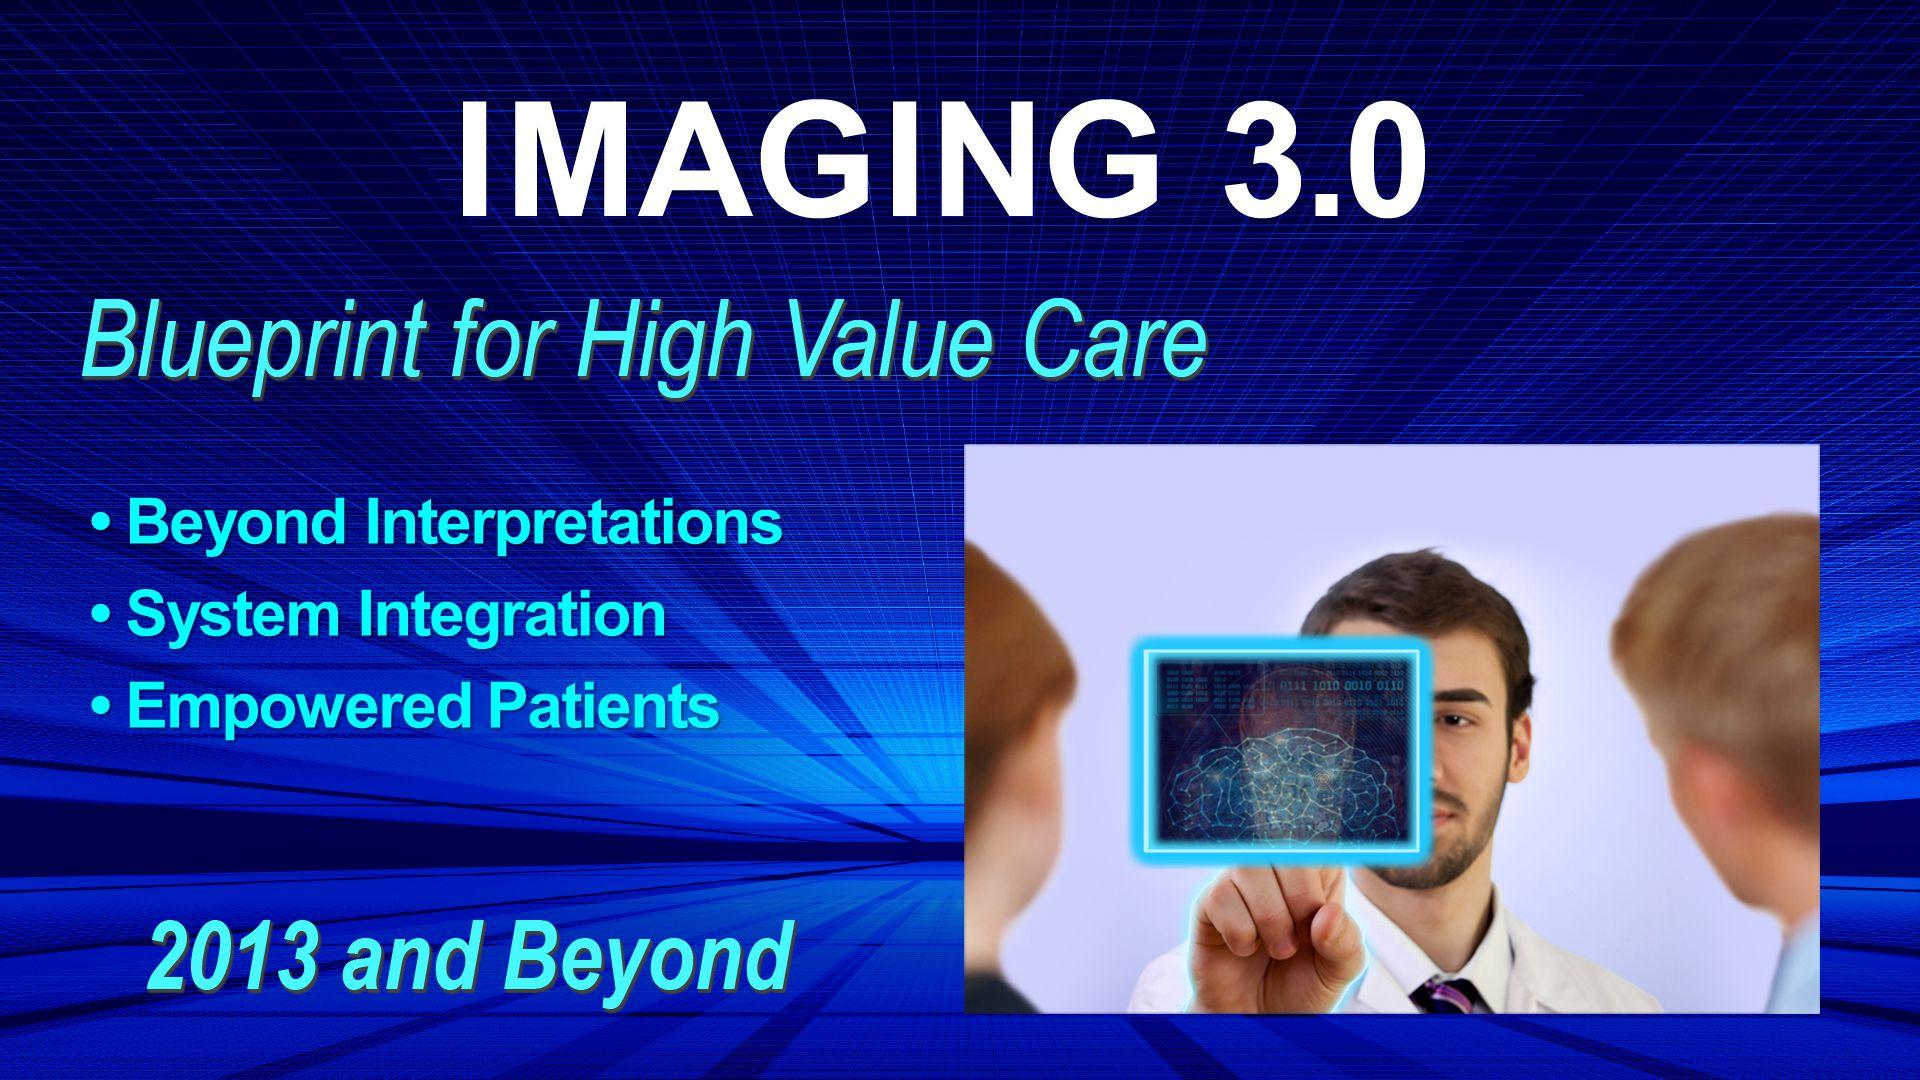 Beyond Interpretations Beyond Interpretations System Integration System Integration Empowered Patients Empowered Patients